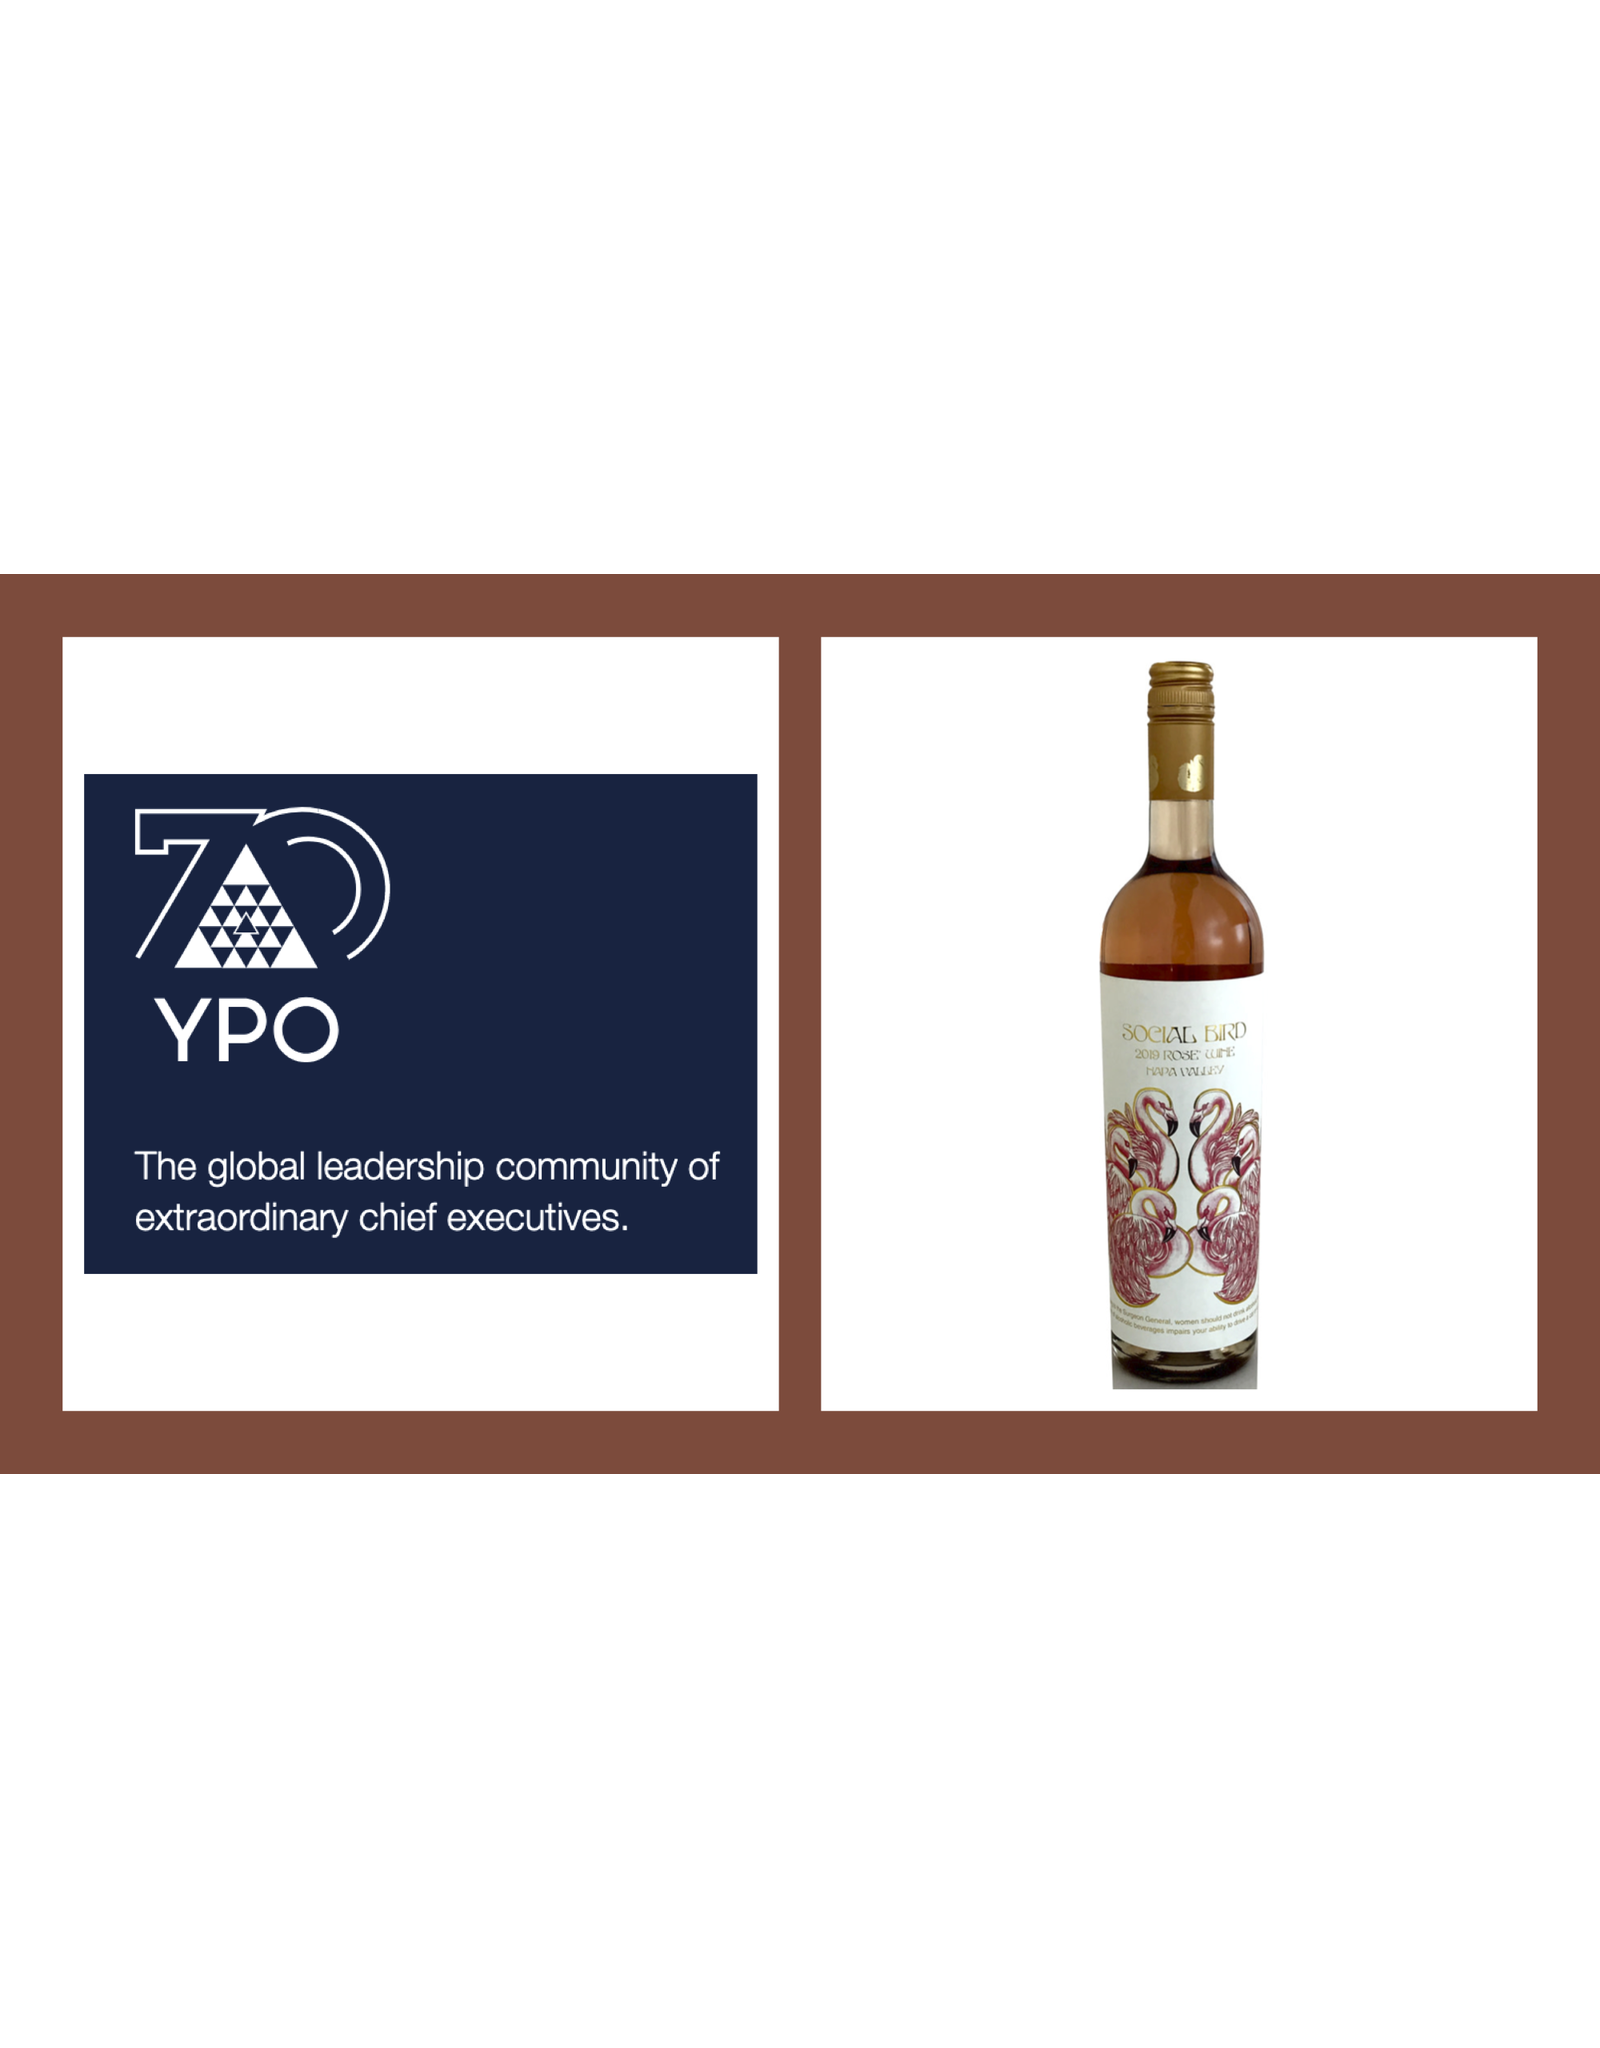 YPO Event - Case Special Pricing -  Social Bird, Rose, Oakville, Napa Valley 2019